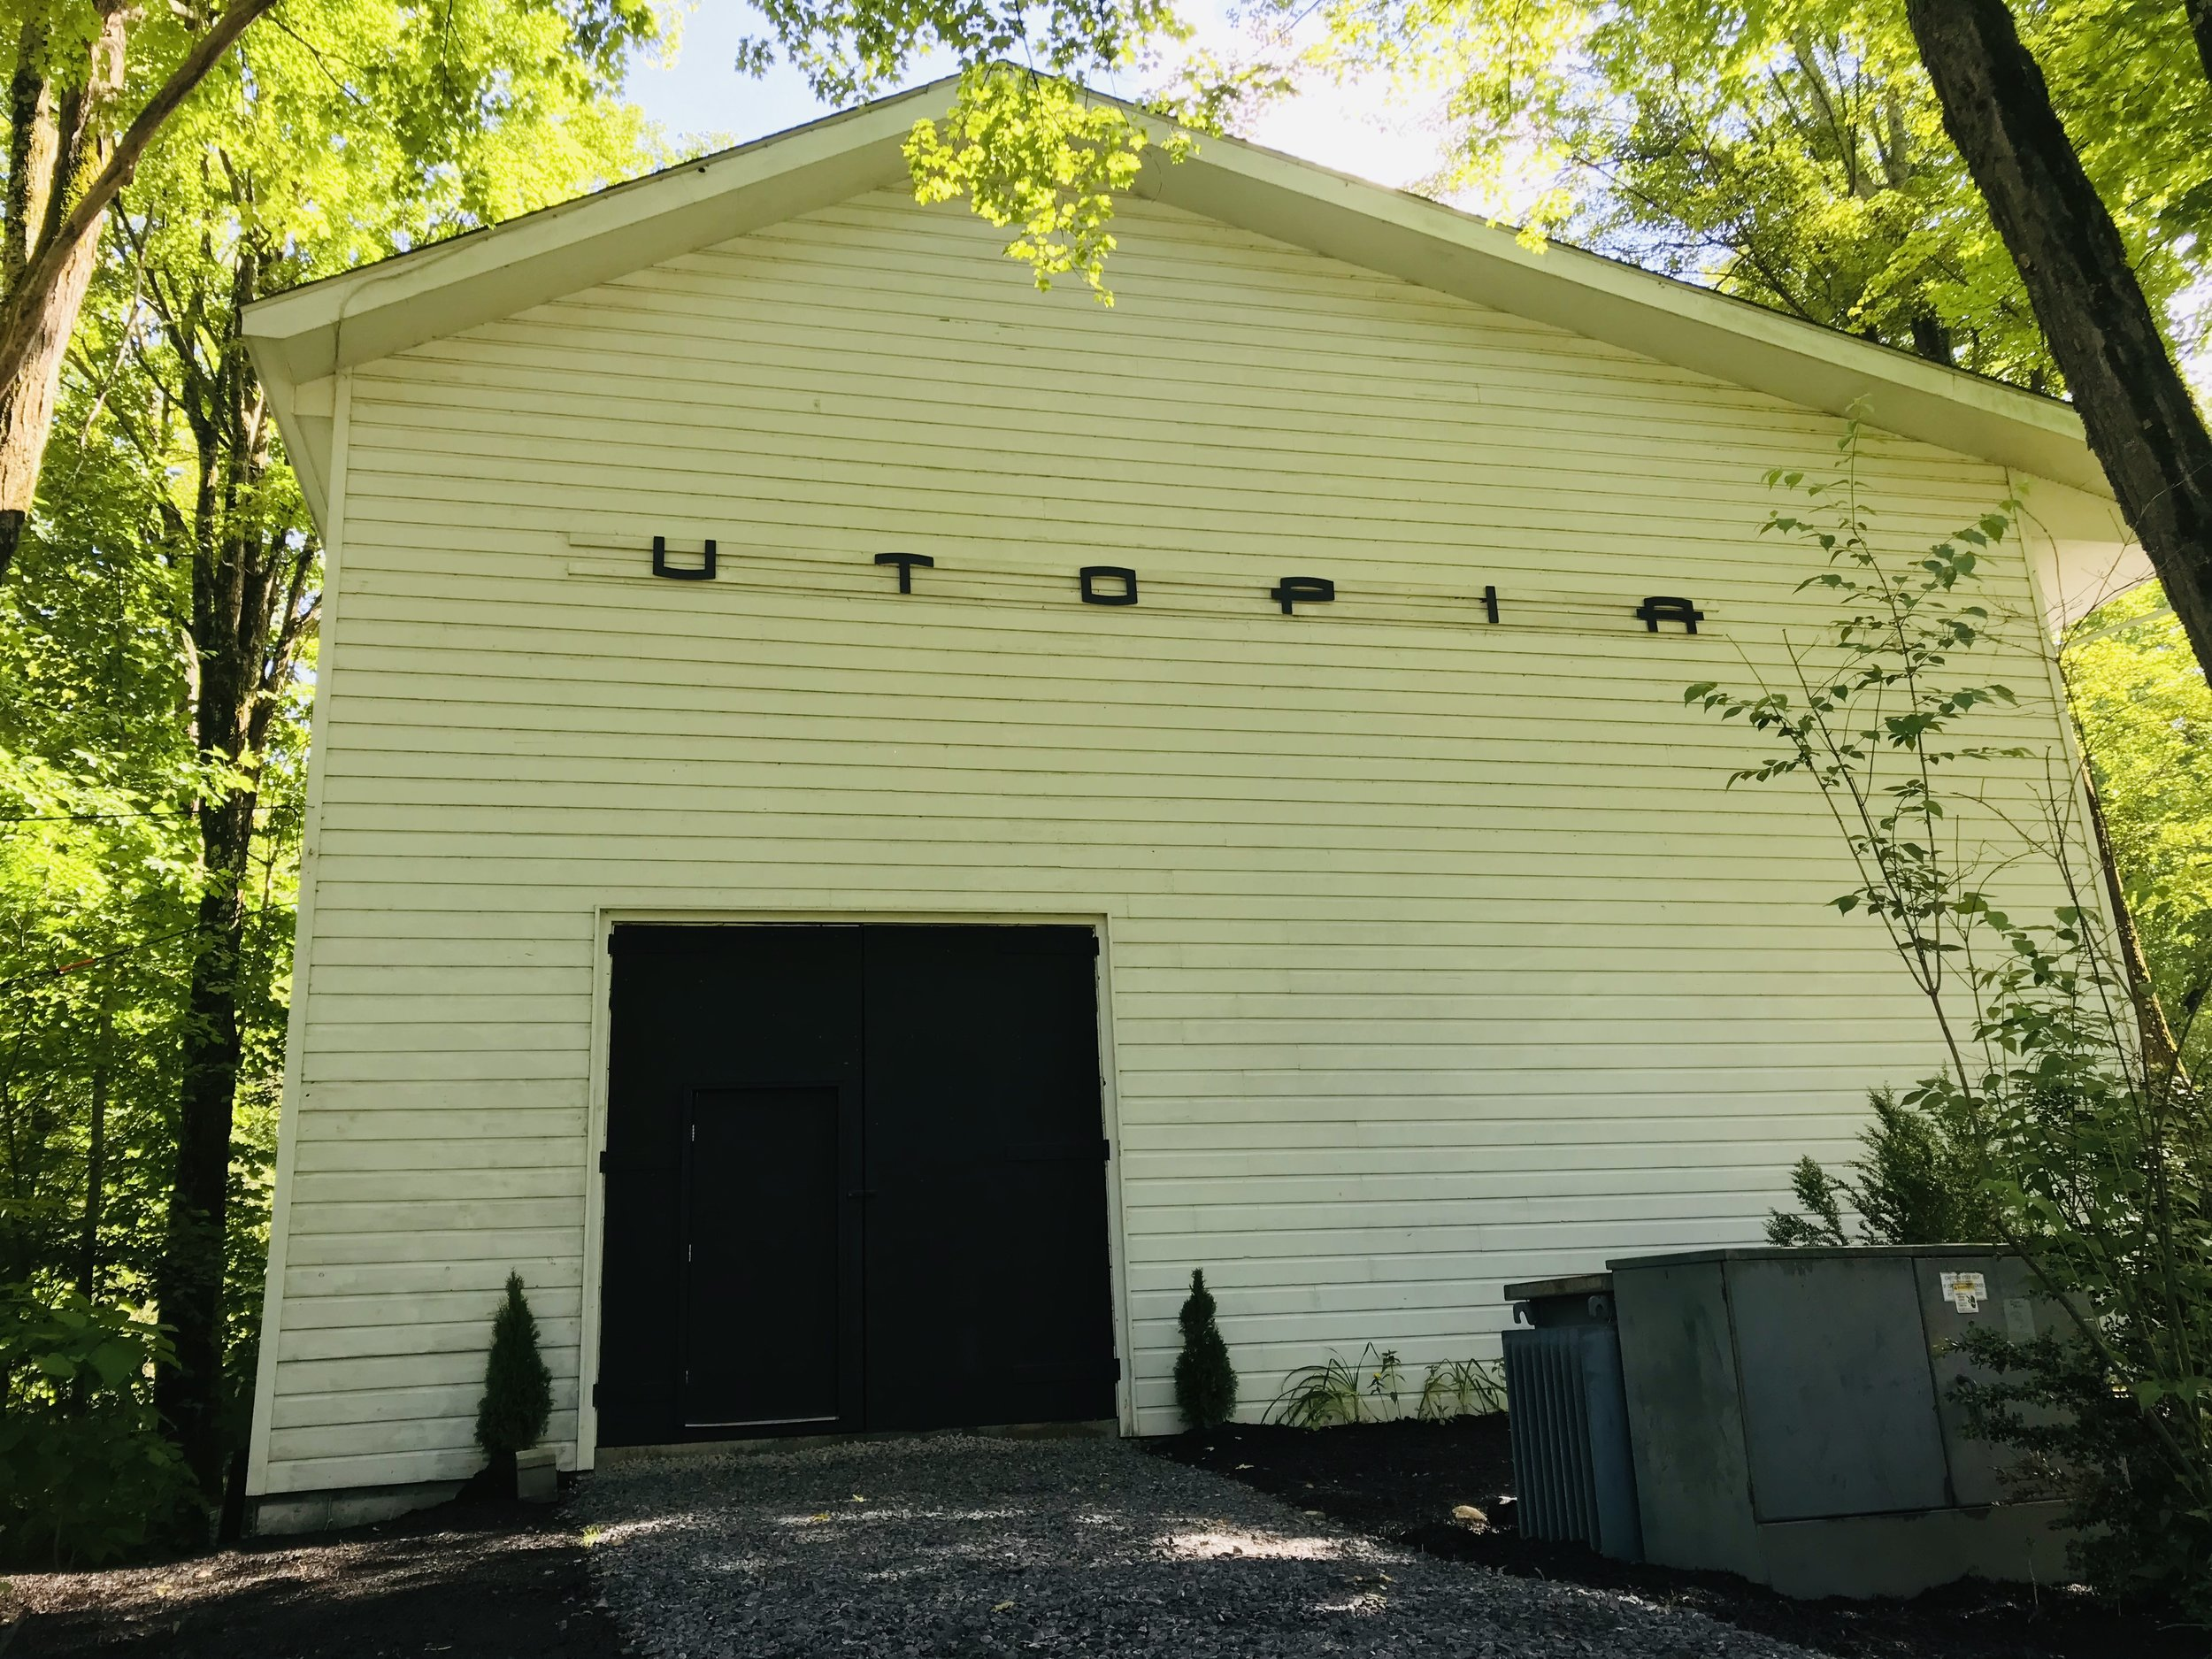 Utopia Soundstage - 293 Tinker Street, Woodstock NY 12498